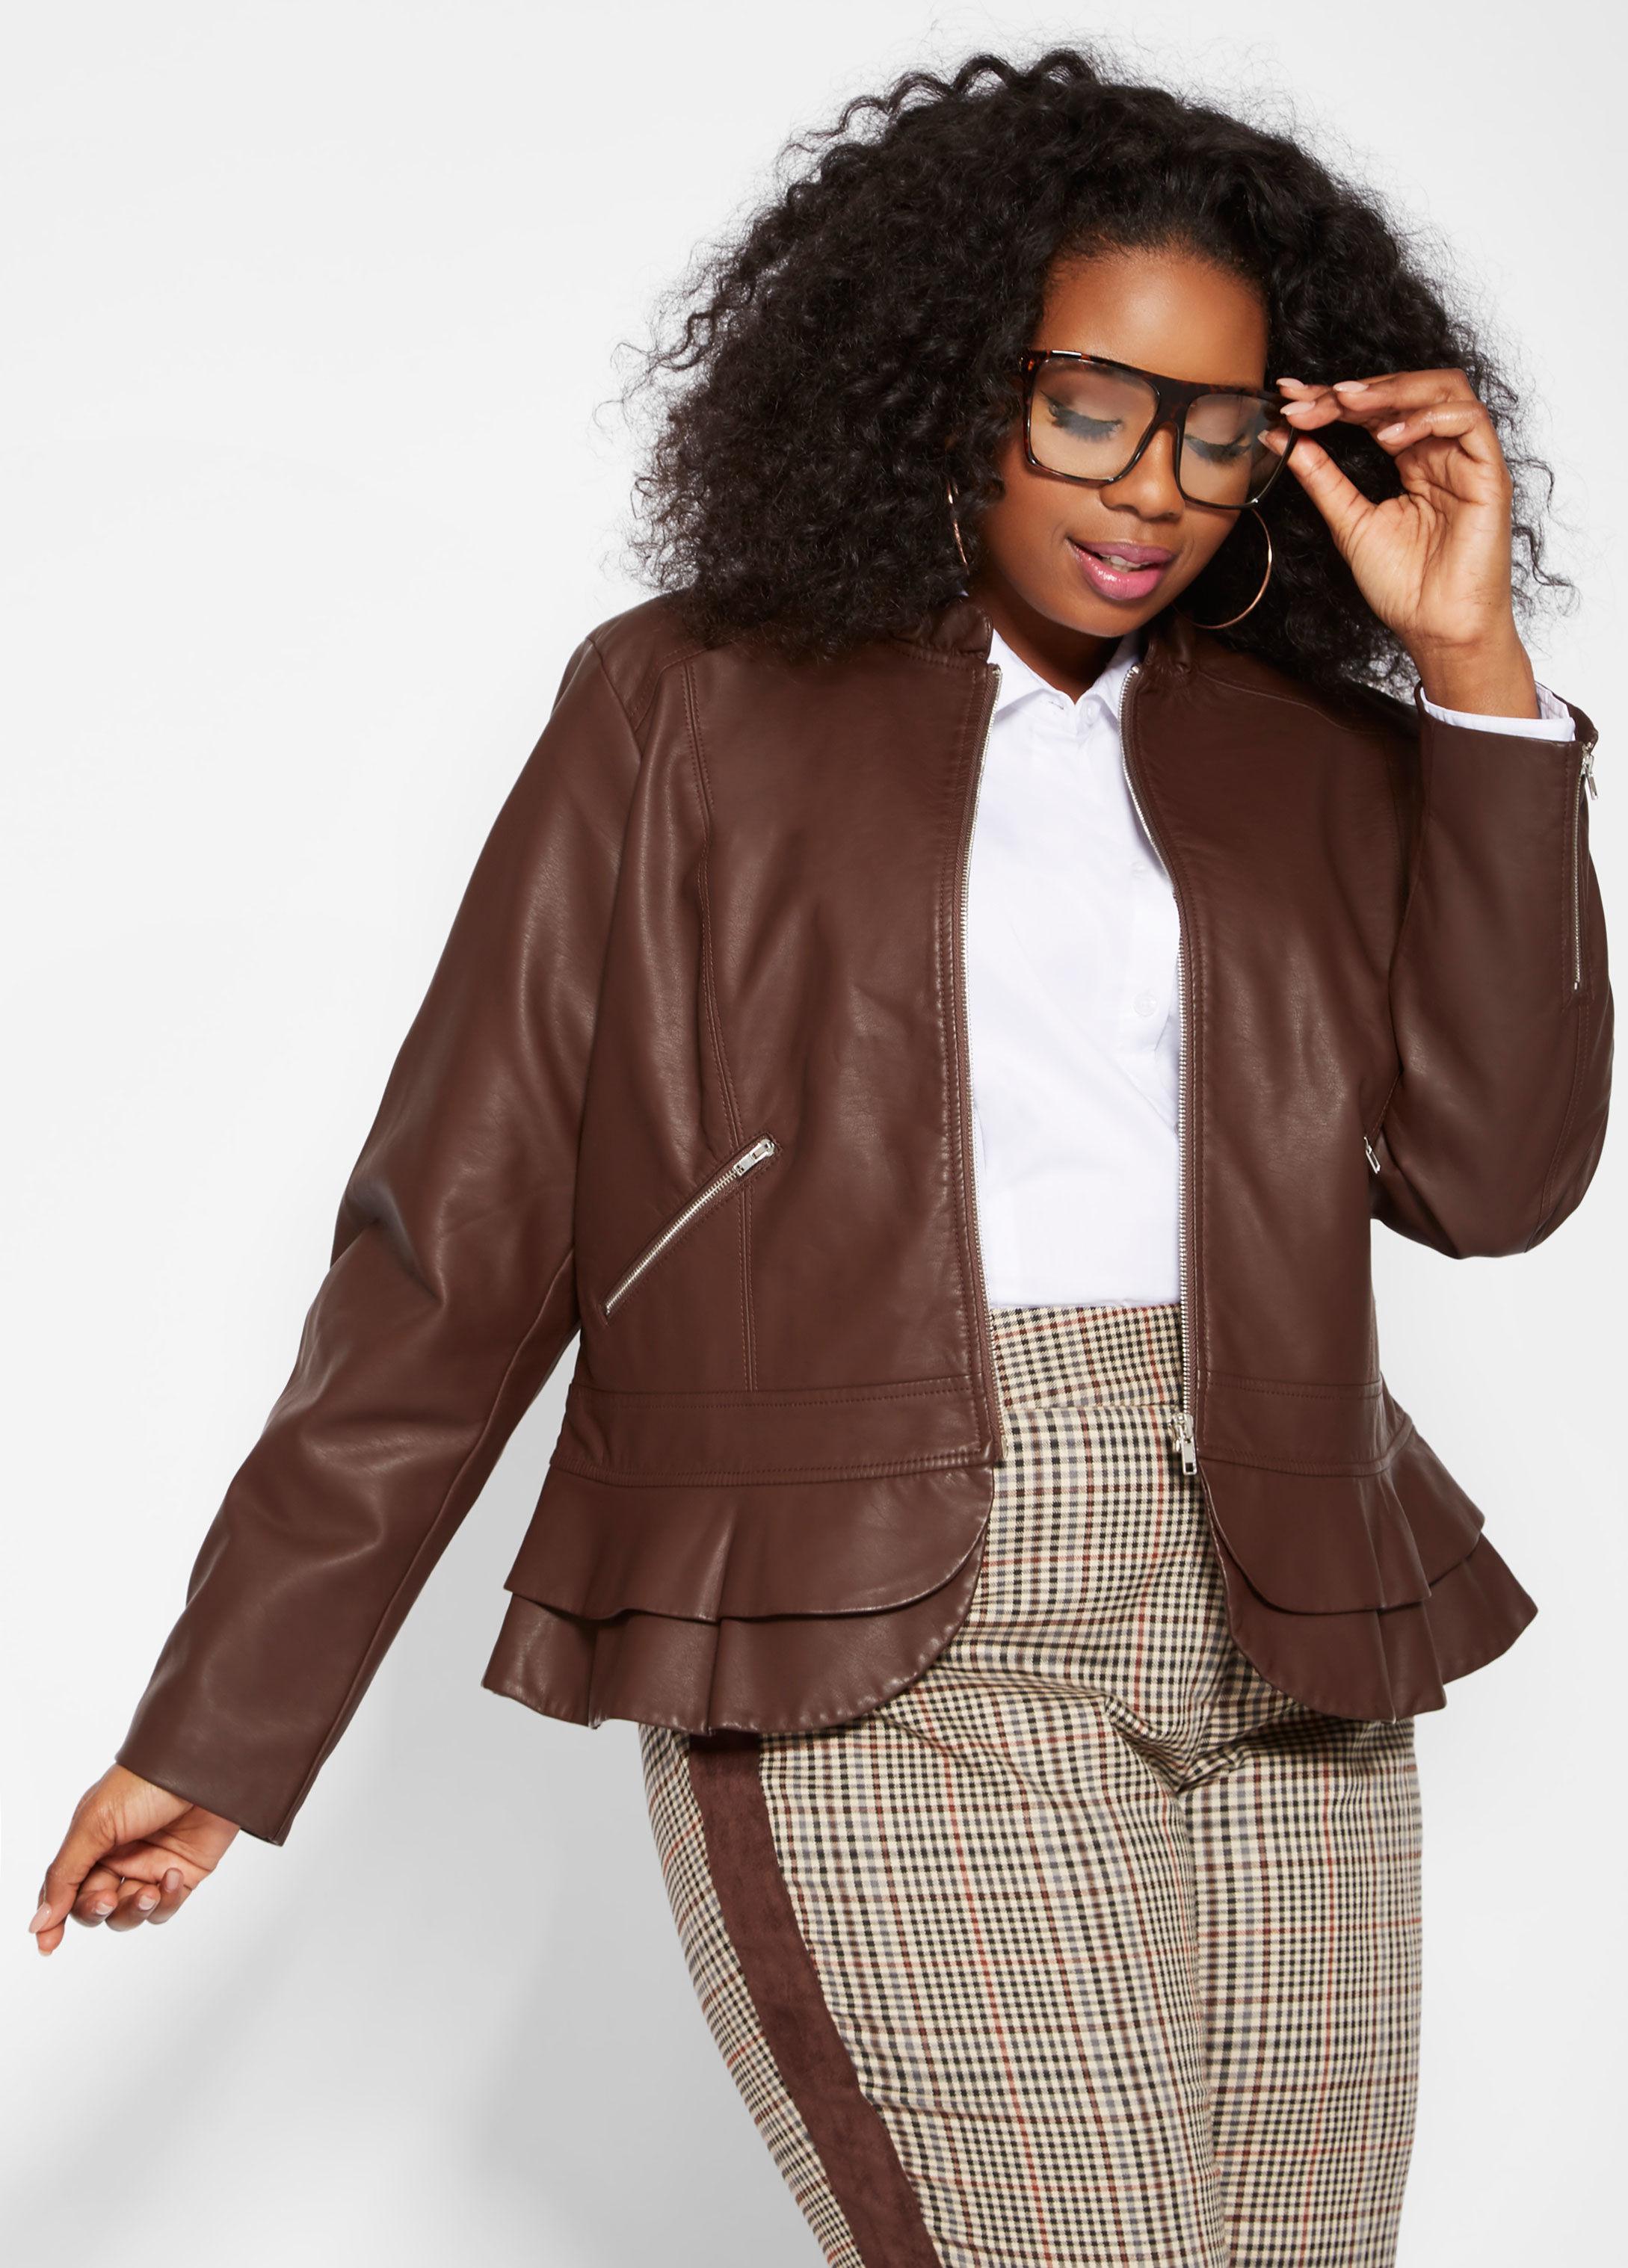 a7c77c5dad73d Lyst - Ashley Stewart Plus Size Double Peplum Faux Leather Jacket in ...